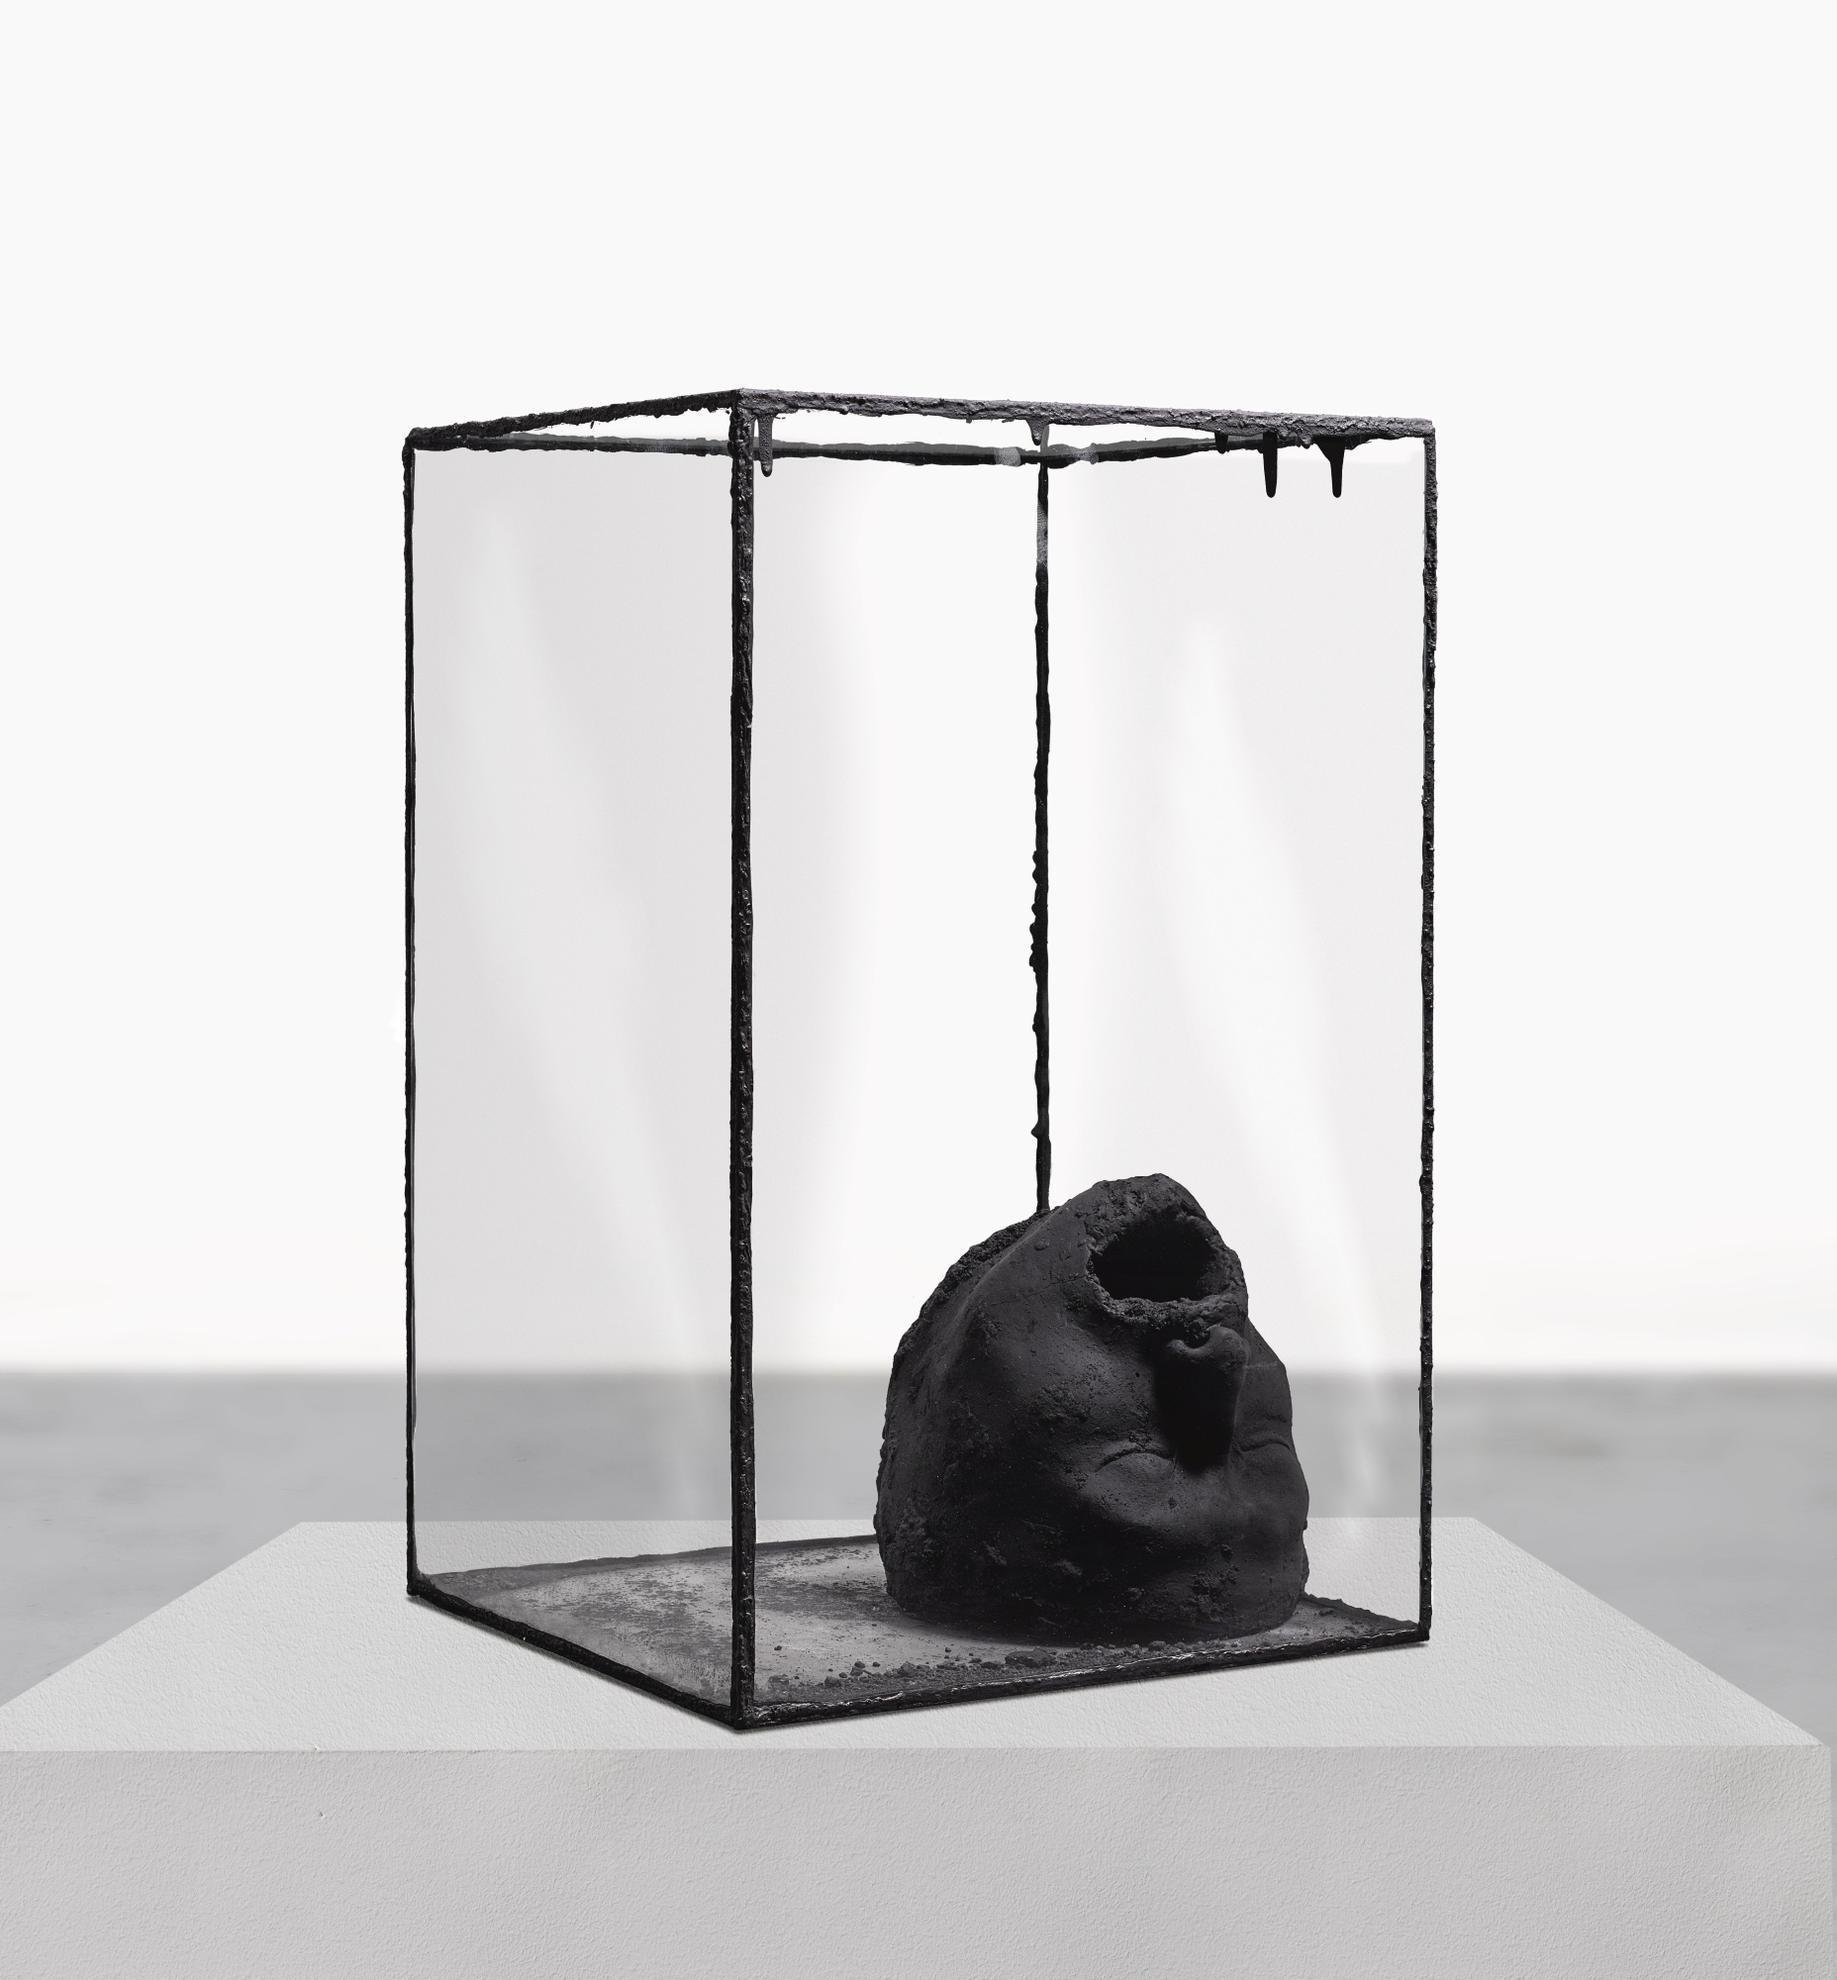 Terence Koh-Blackhead-2006